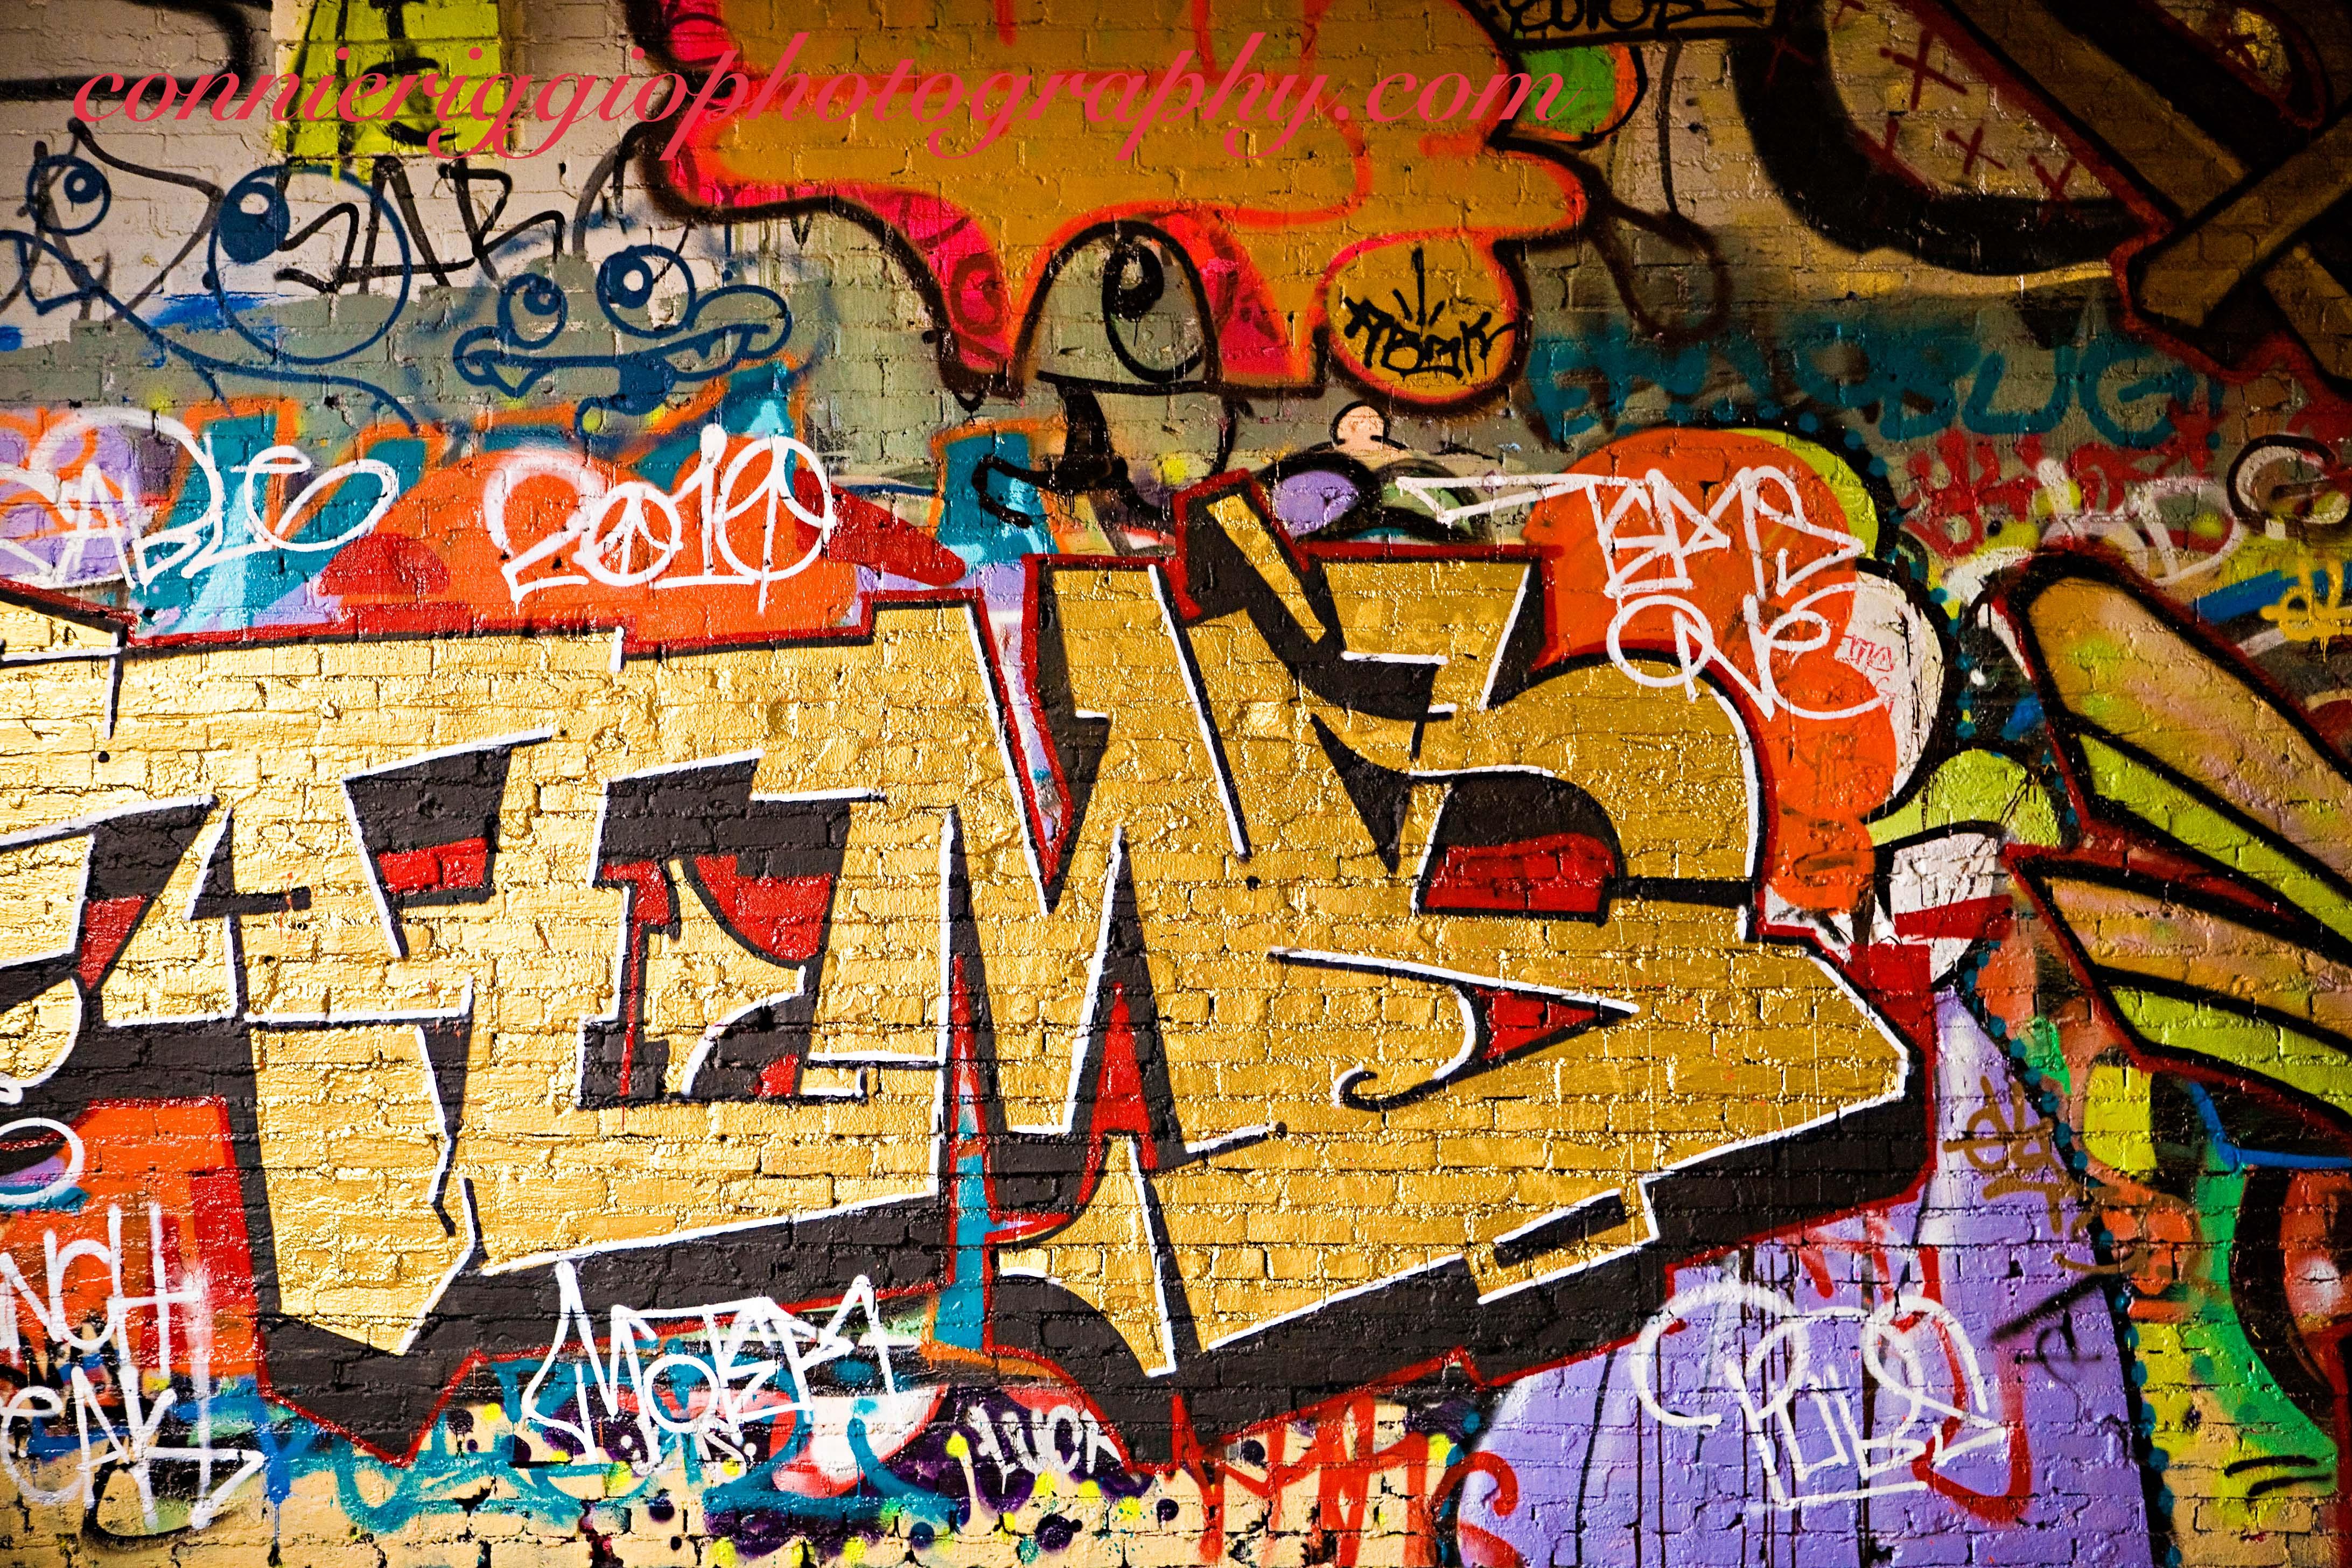 Graffiti wall tacoma - Graffiti Wall